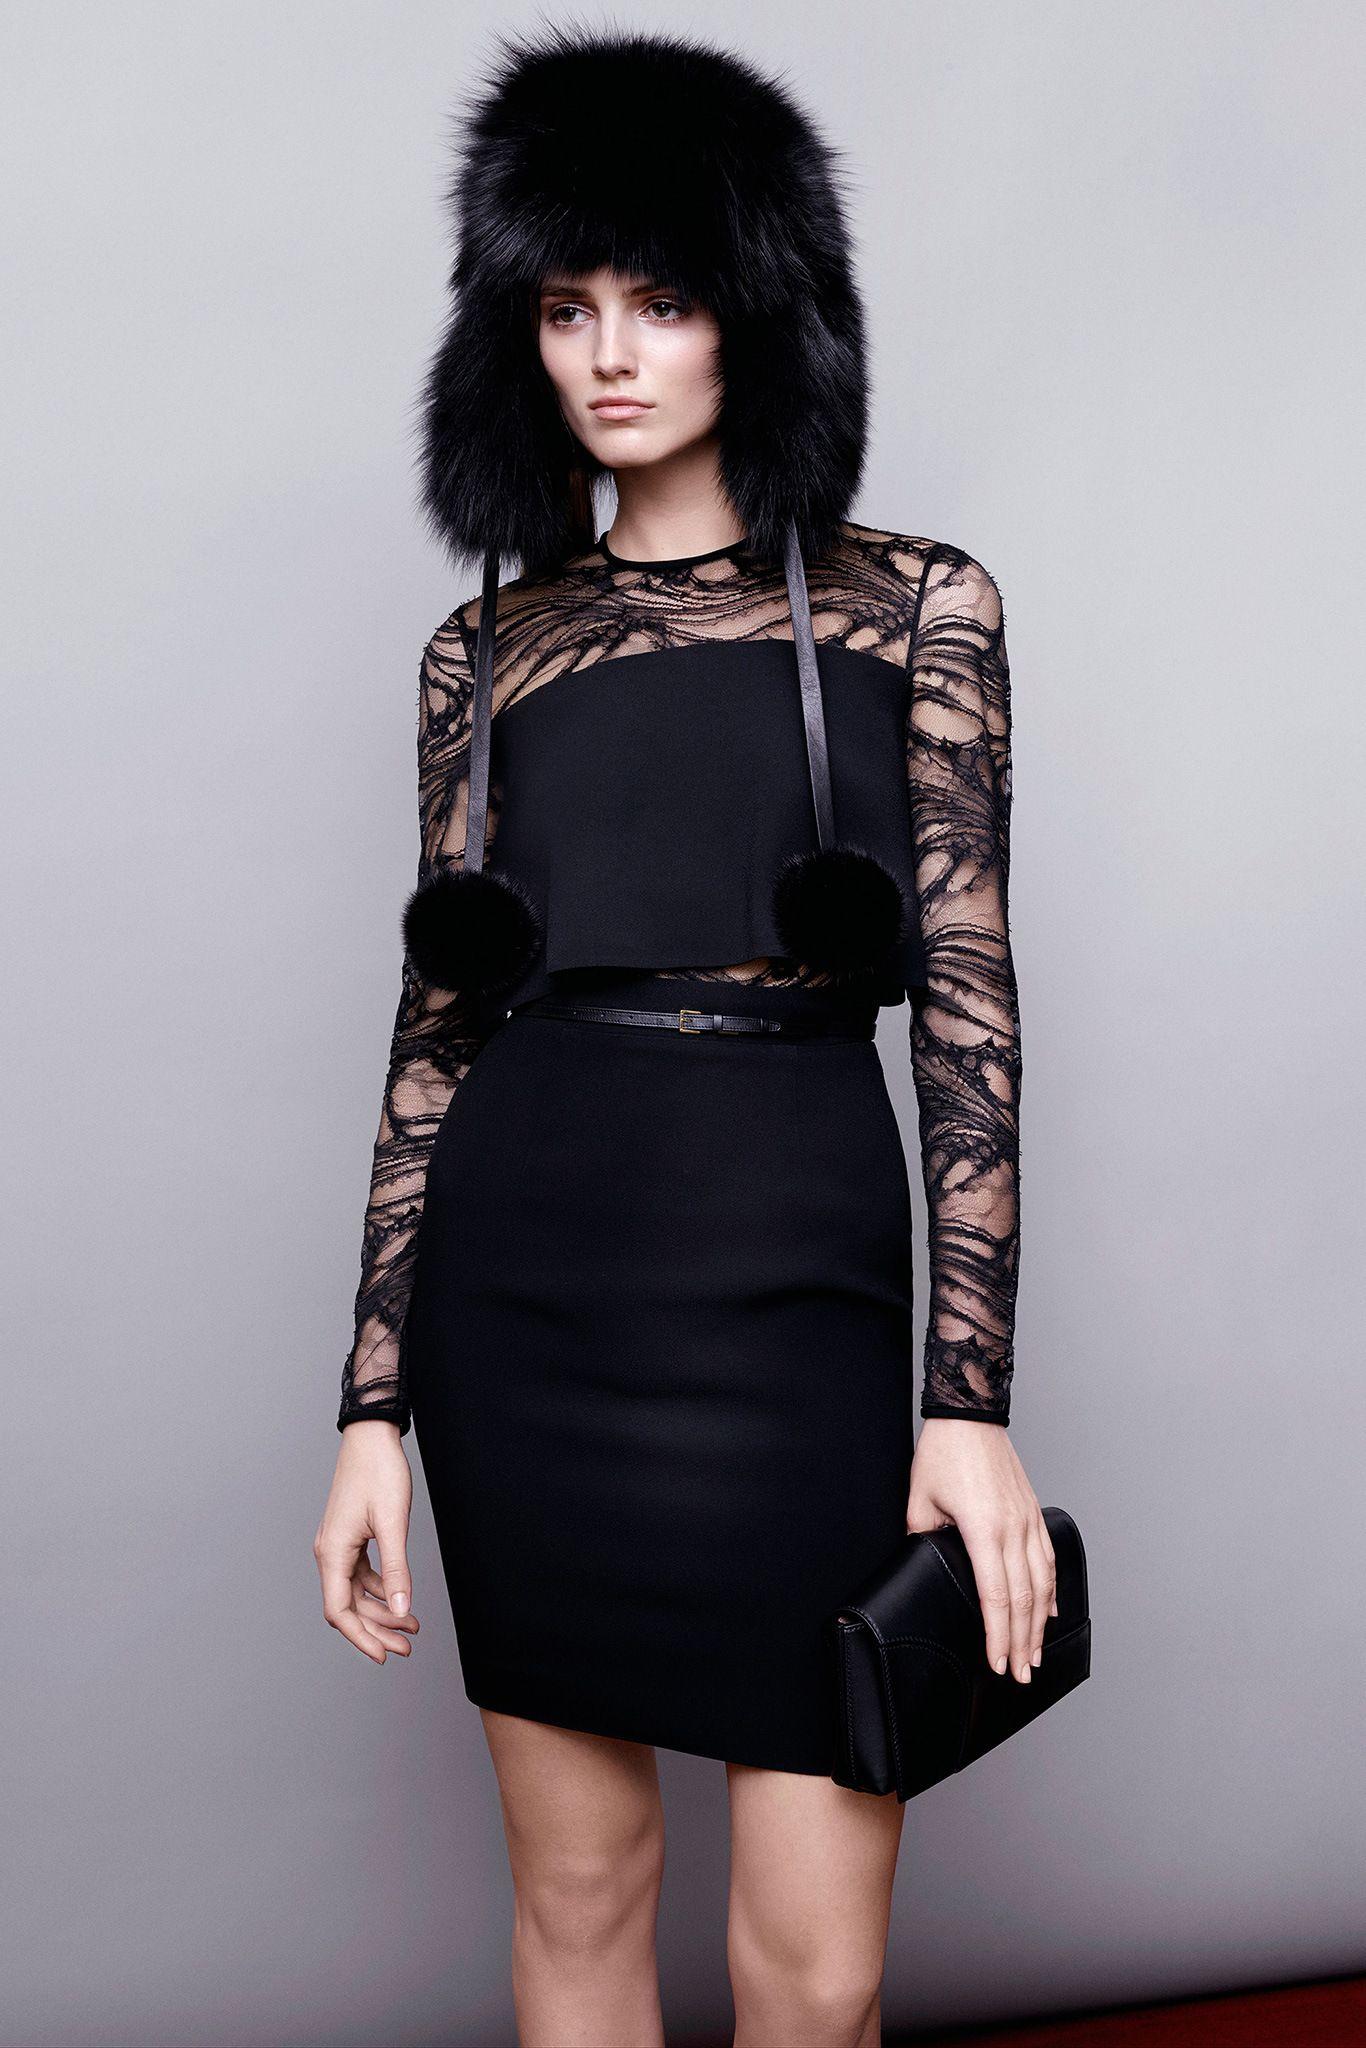 Elie Saab PF 15 look book | Fashion, Fall 2015 style